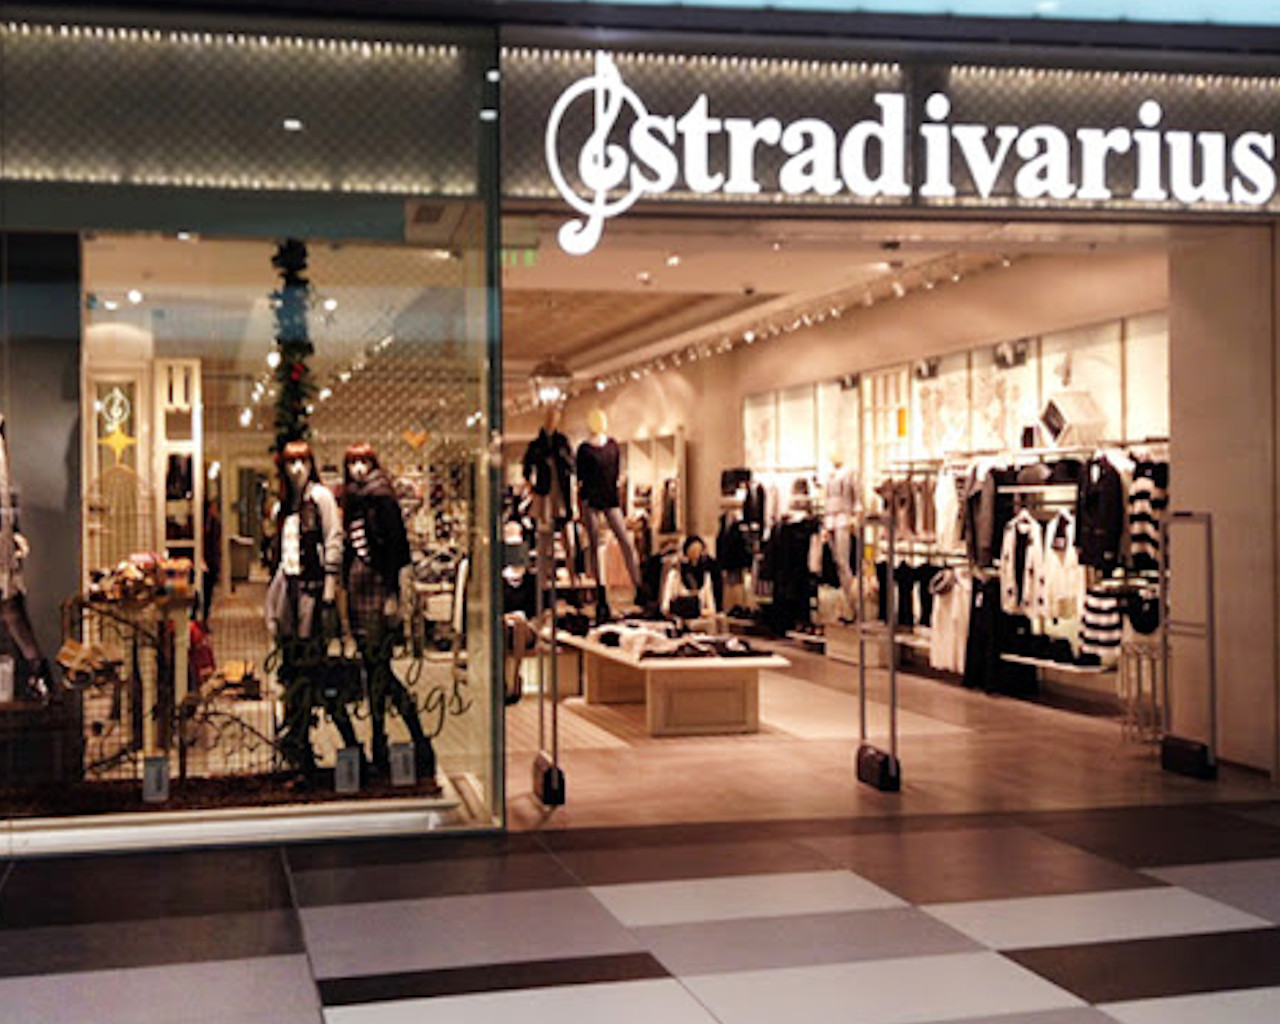 stradivarious,stradivarius τσαντεσ,stradivarius εκπτωσεισ,stradivarius φορεματα,stradivarius τζιν,stradivarius φουστεσ,stradivarius παπουτσια,stradivarius μπλουζεσ